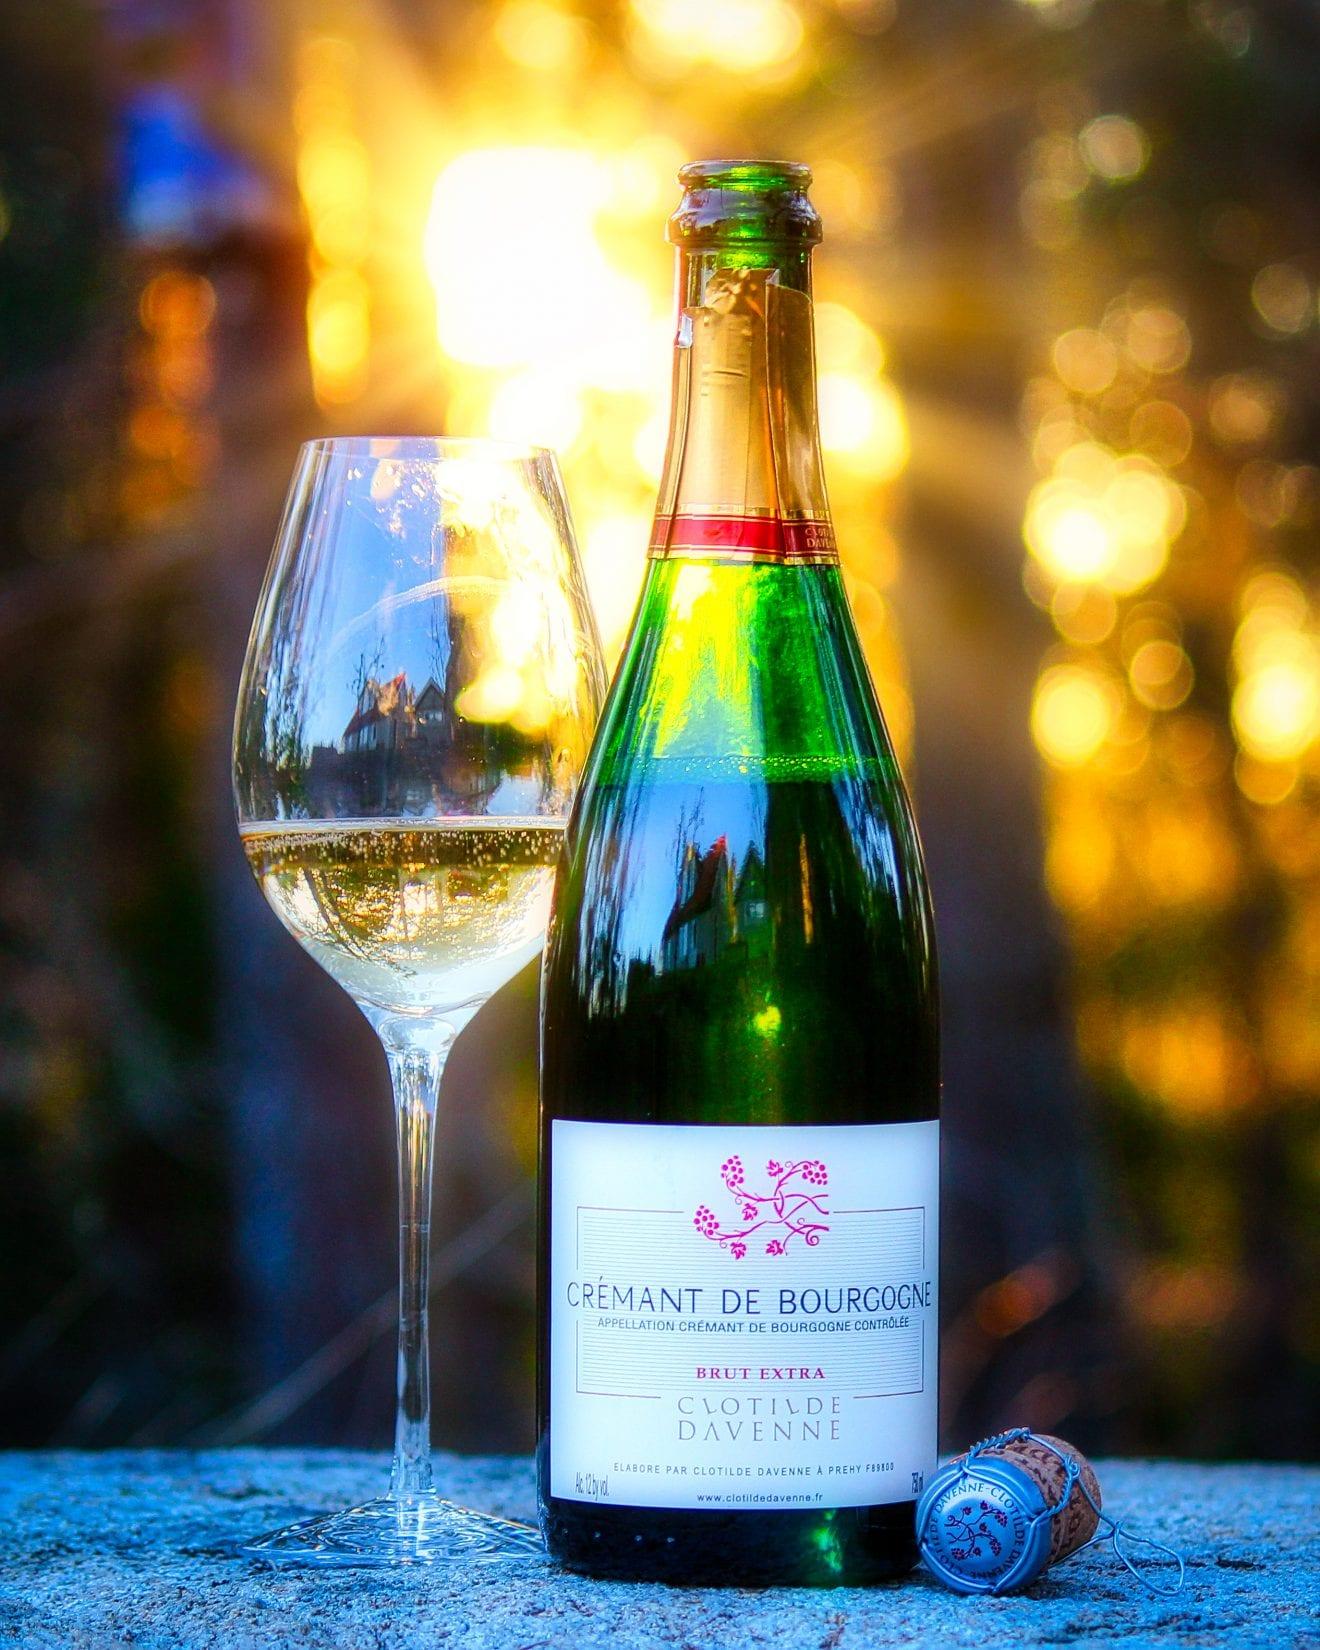 Clotilde Davenne Crémant de Bourgogne Extra Brut